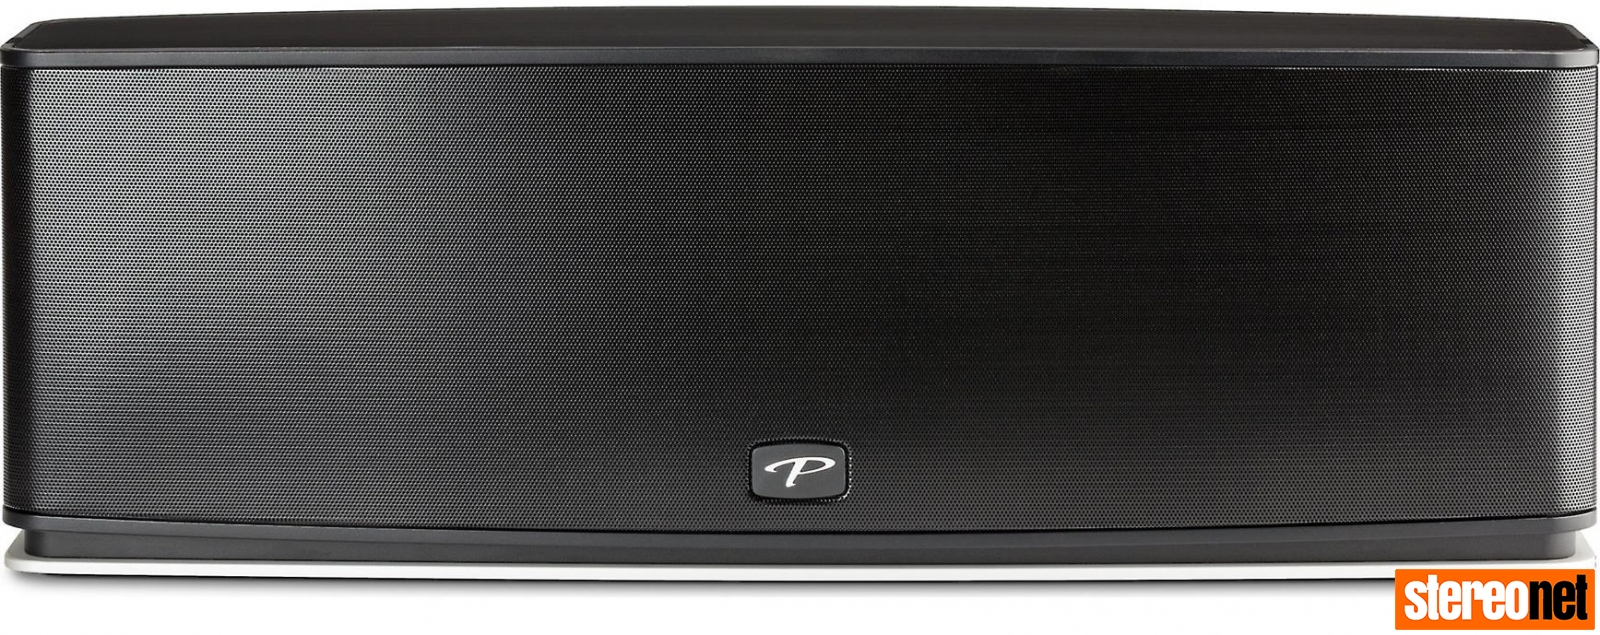 Paradigm speaker DTS Play-Fi Alexa